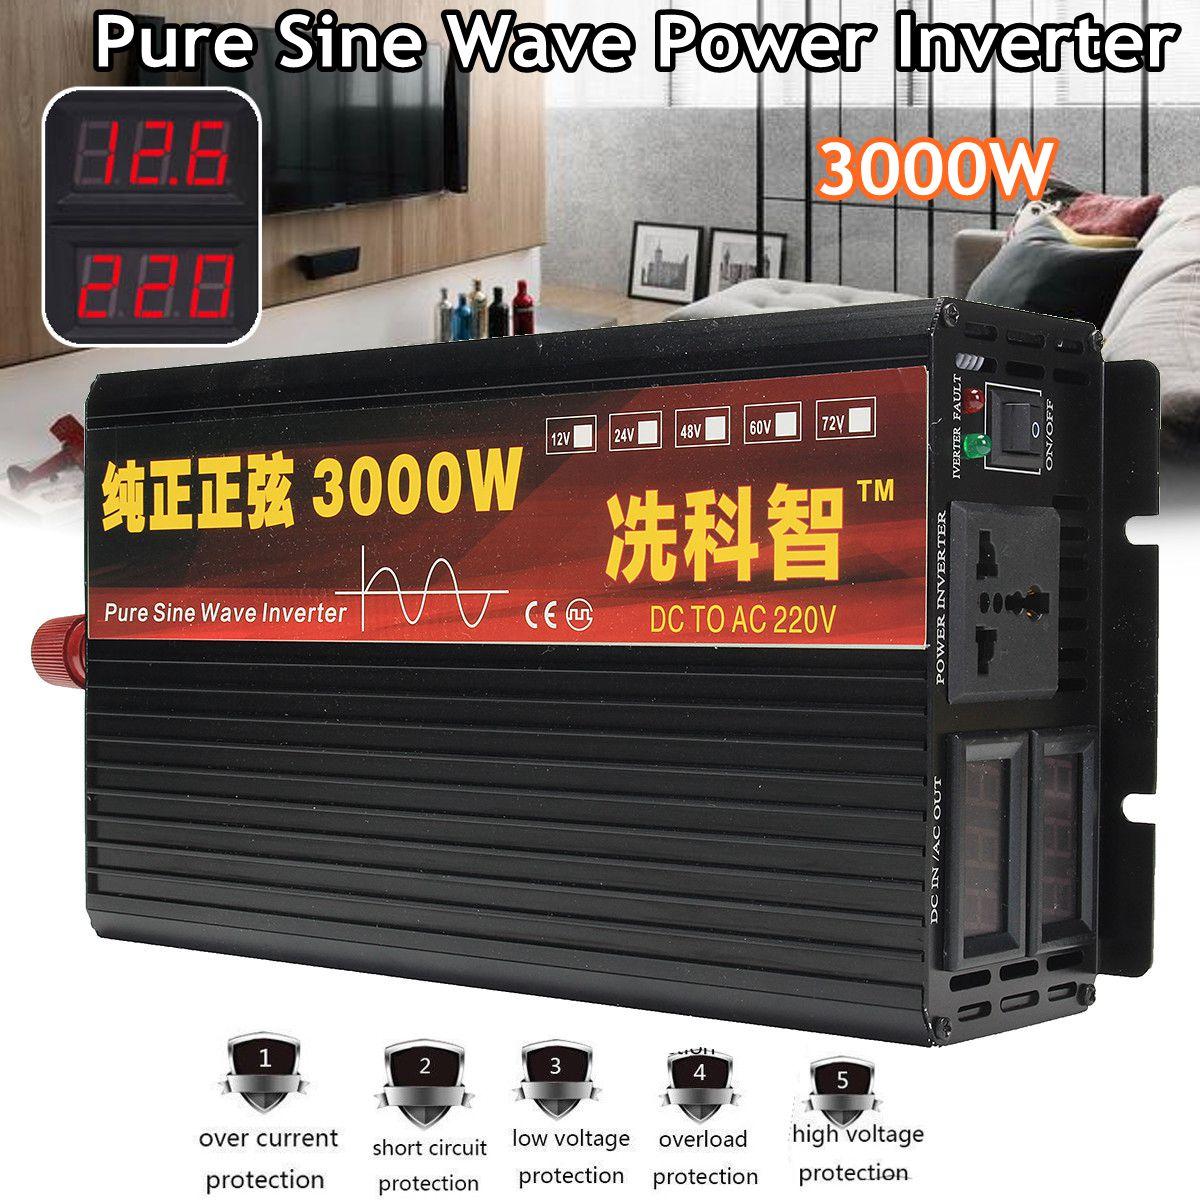 Onduleur 12 V/24 V 220 V 2000/3000/4000 W transformateur Pur Onde sinusoïdale onduleur DC12V à AC 220 V Convertisseur + 2 led Affichage